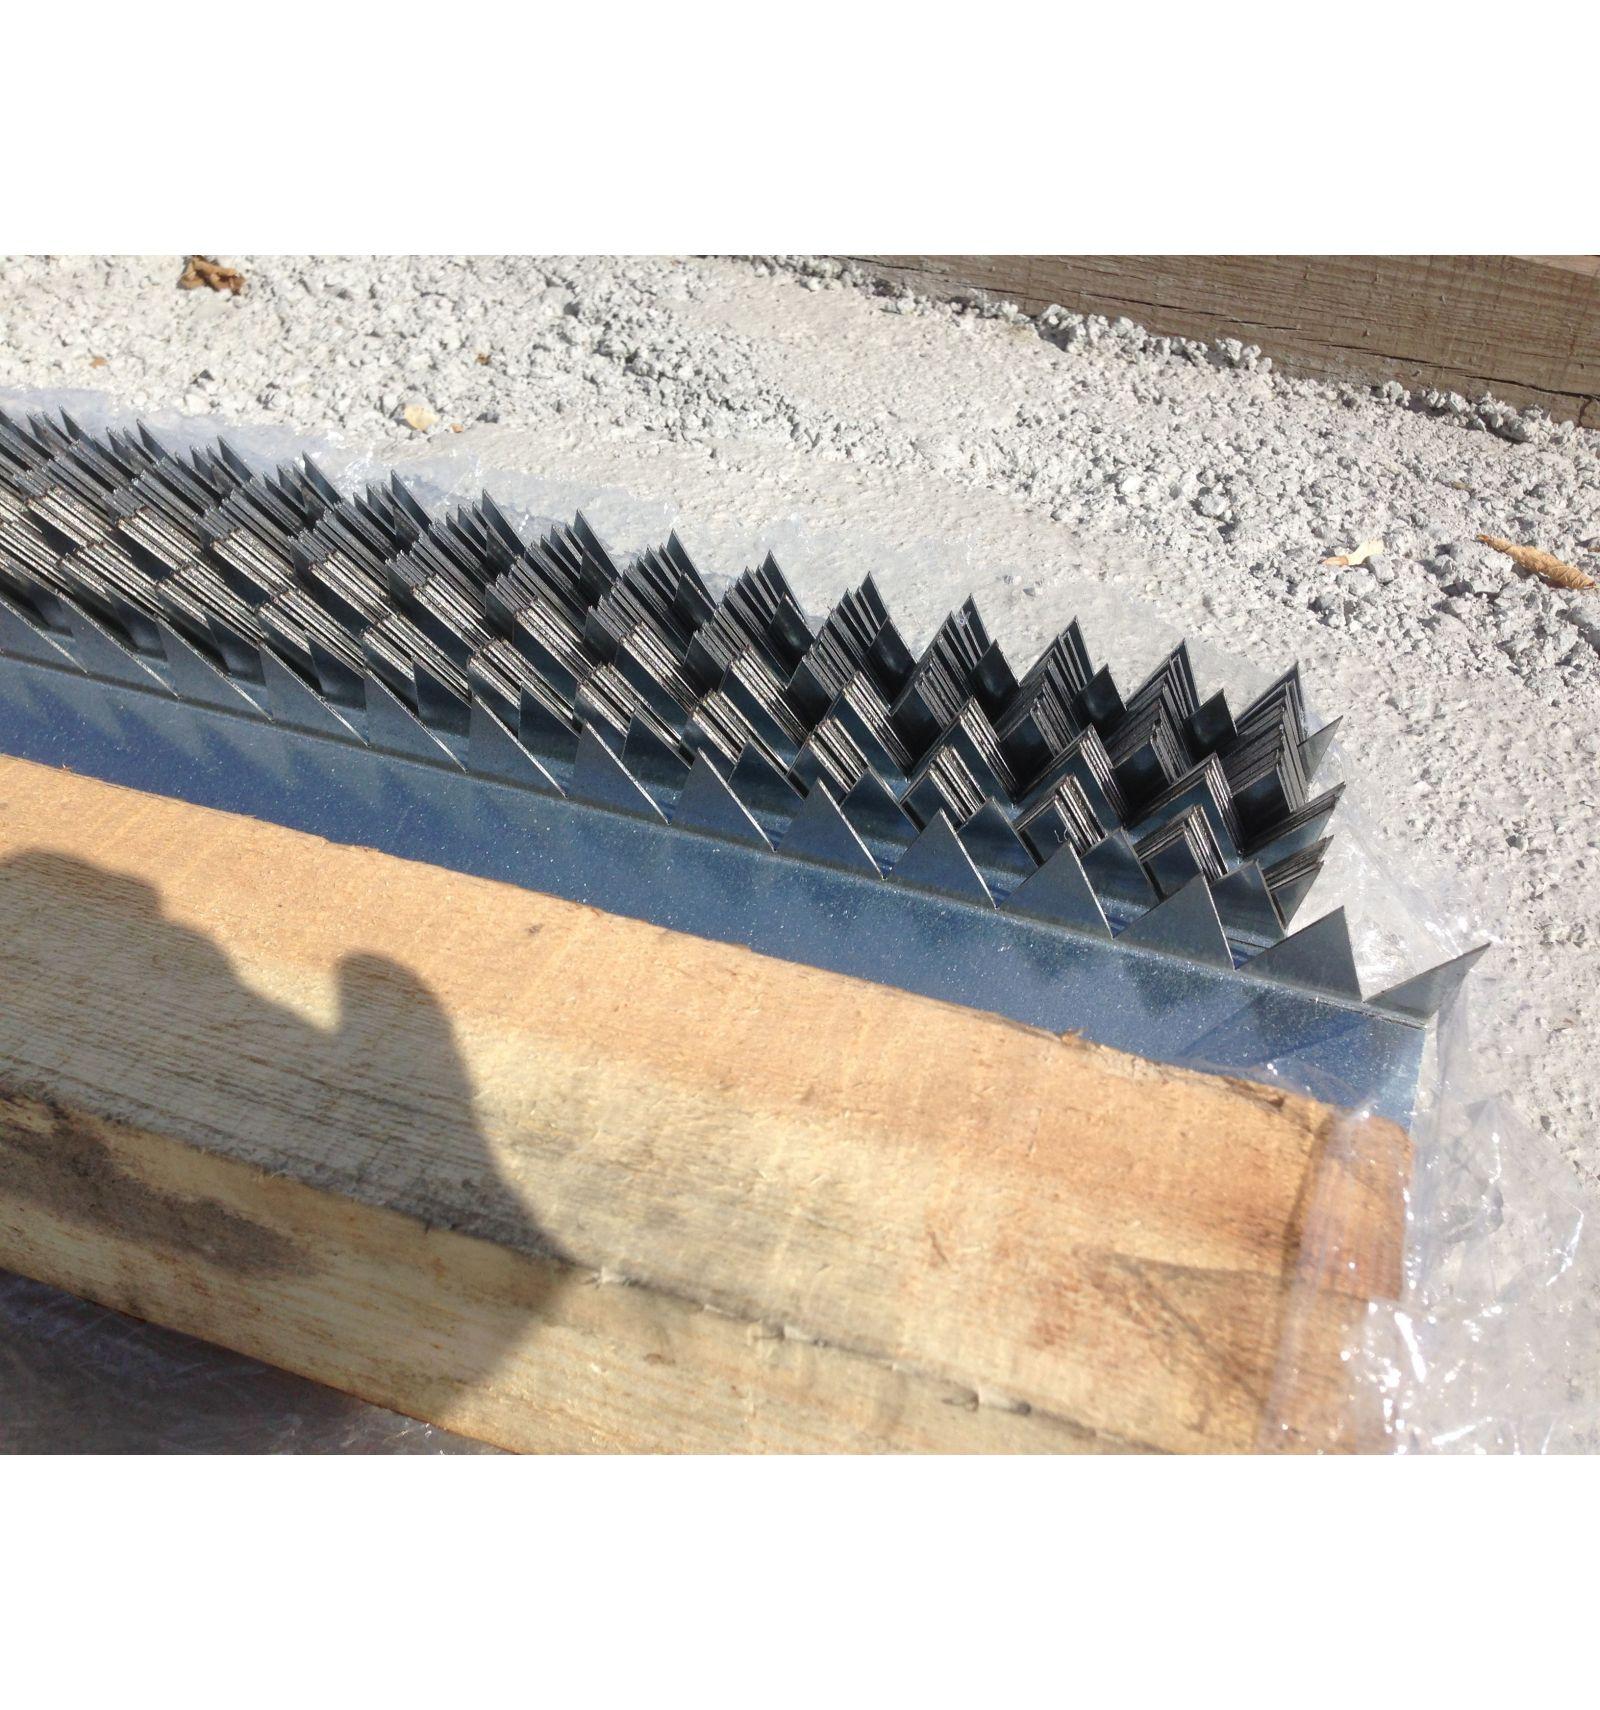 Steel Landscape Edging Of 3 Meters Long - Velestone Cantos ... dedans Velestone Avis